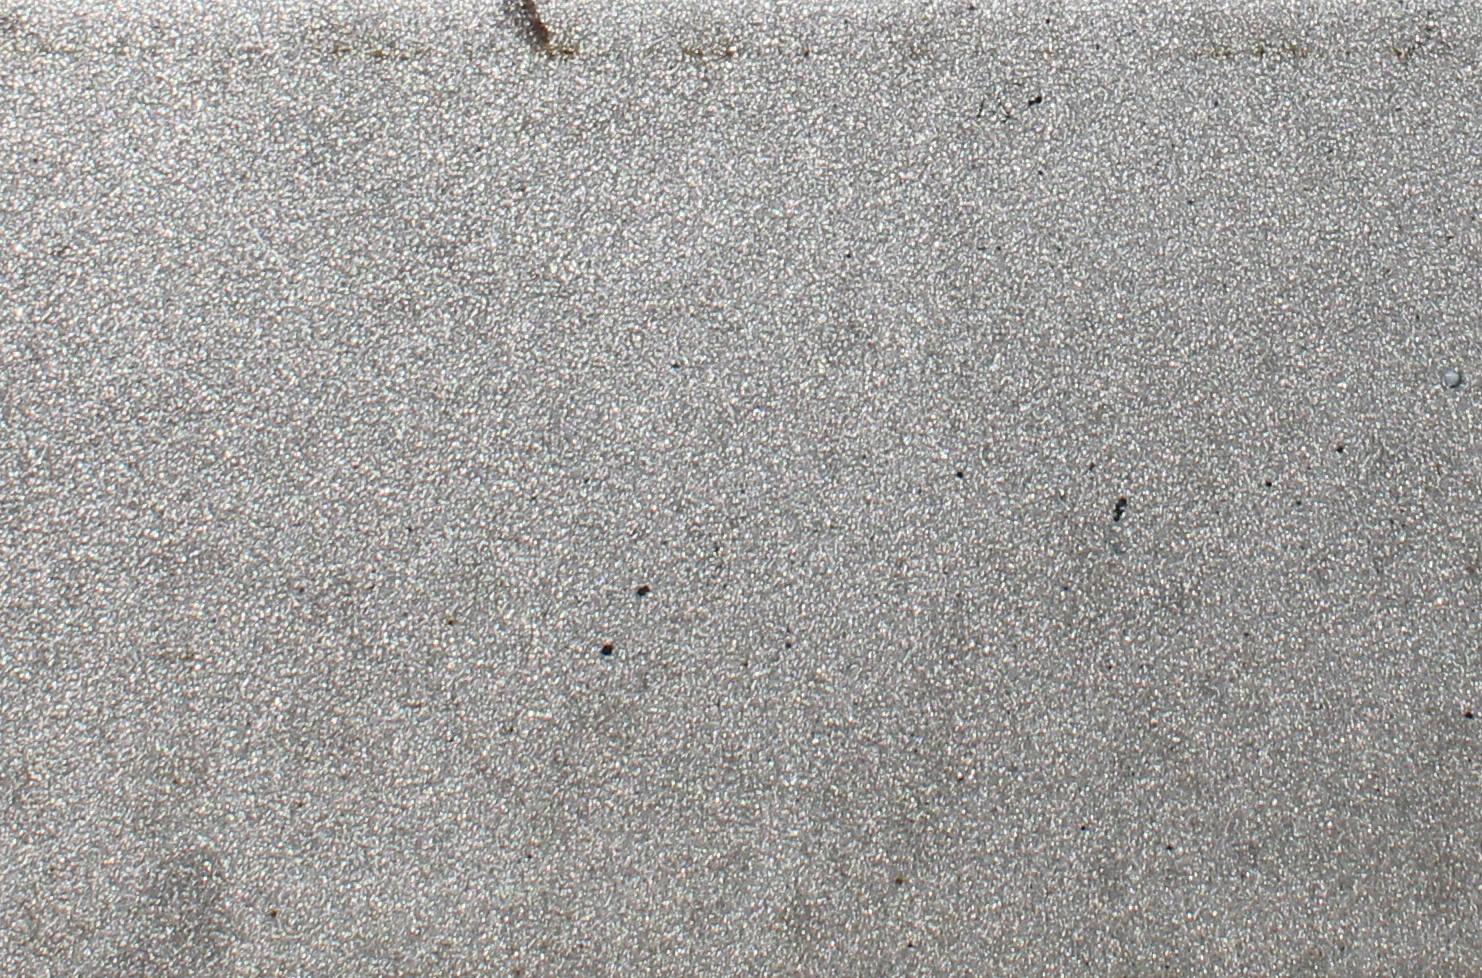 Silver Paint Texture